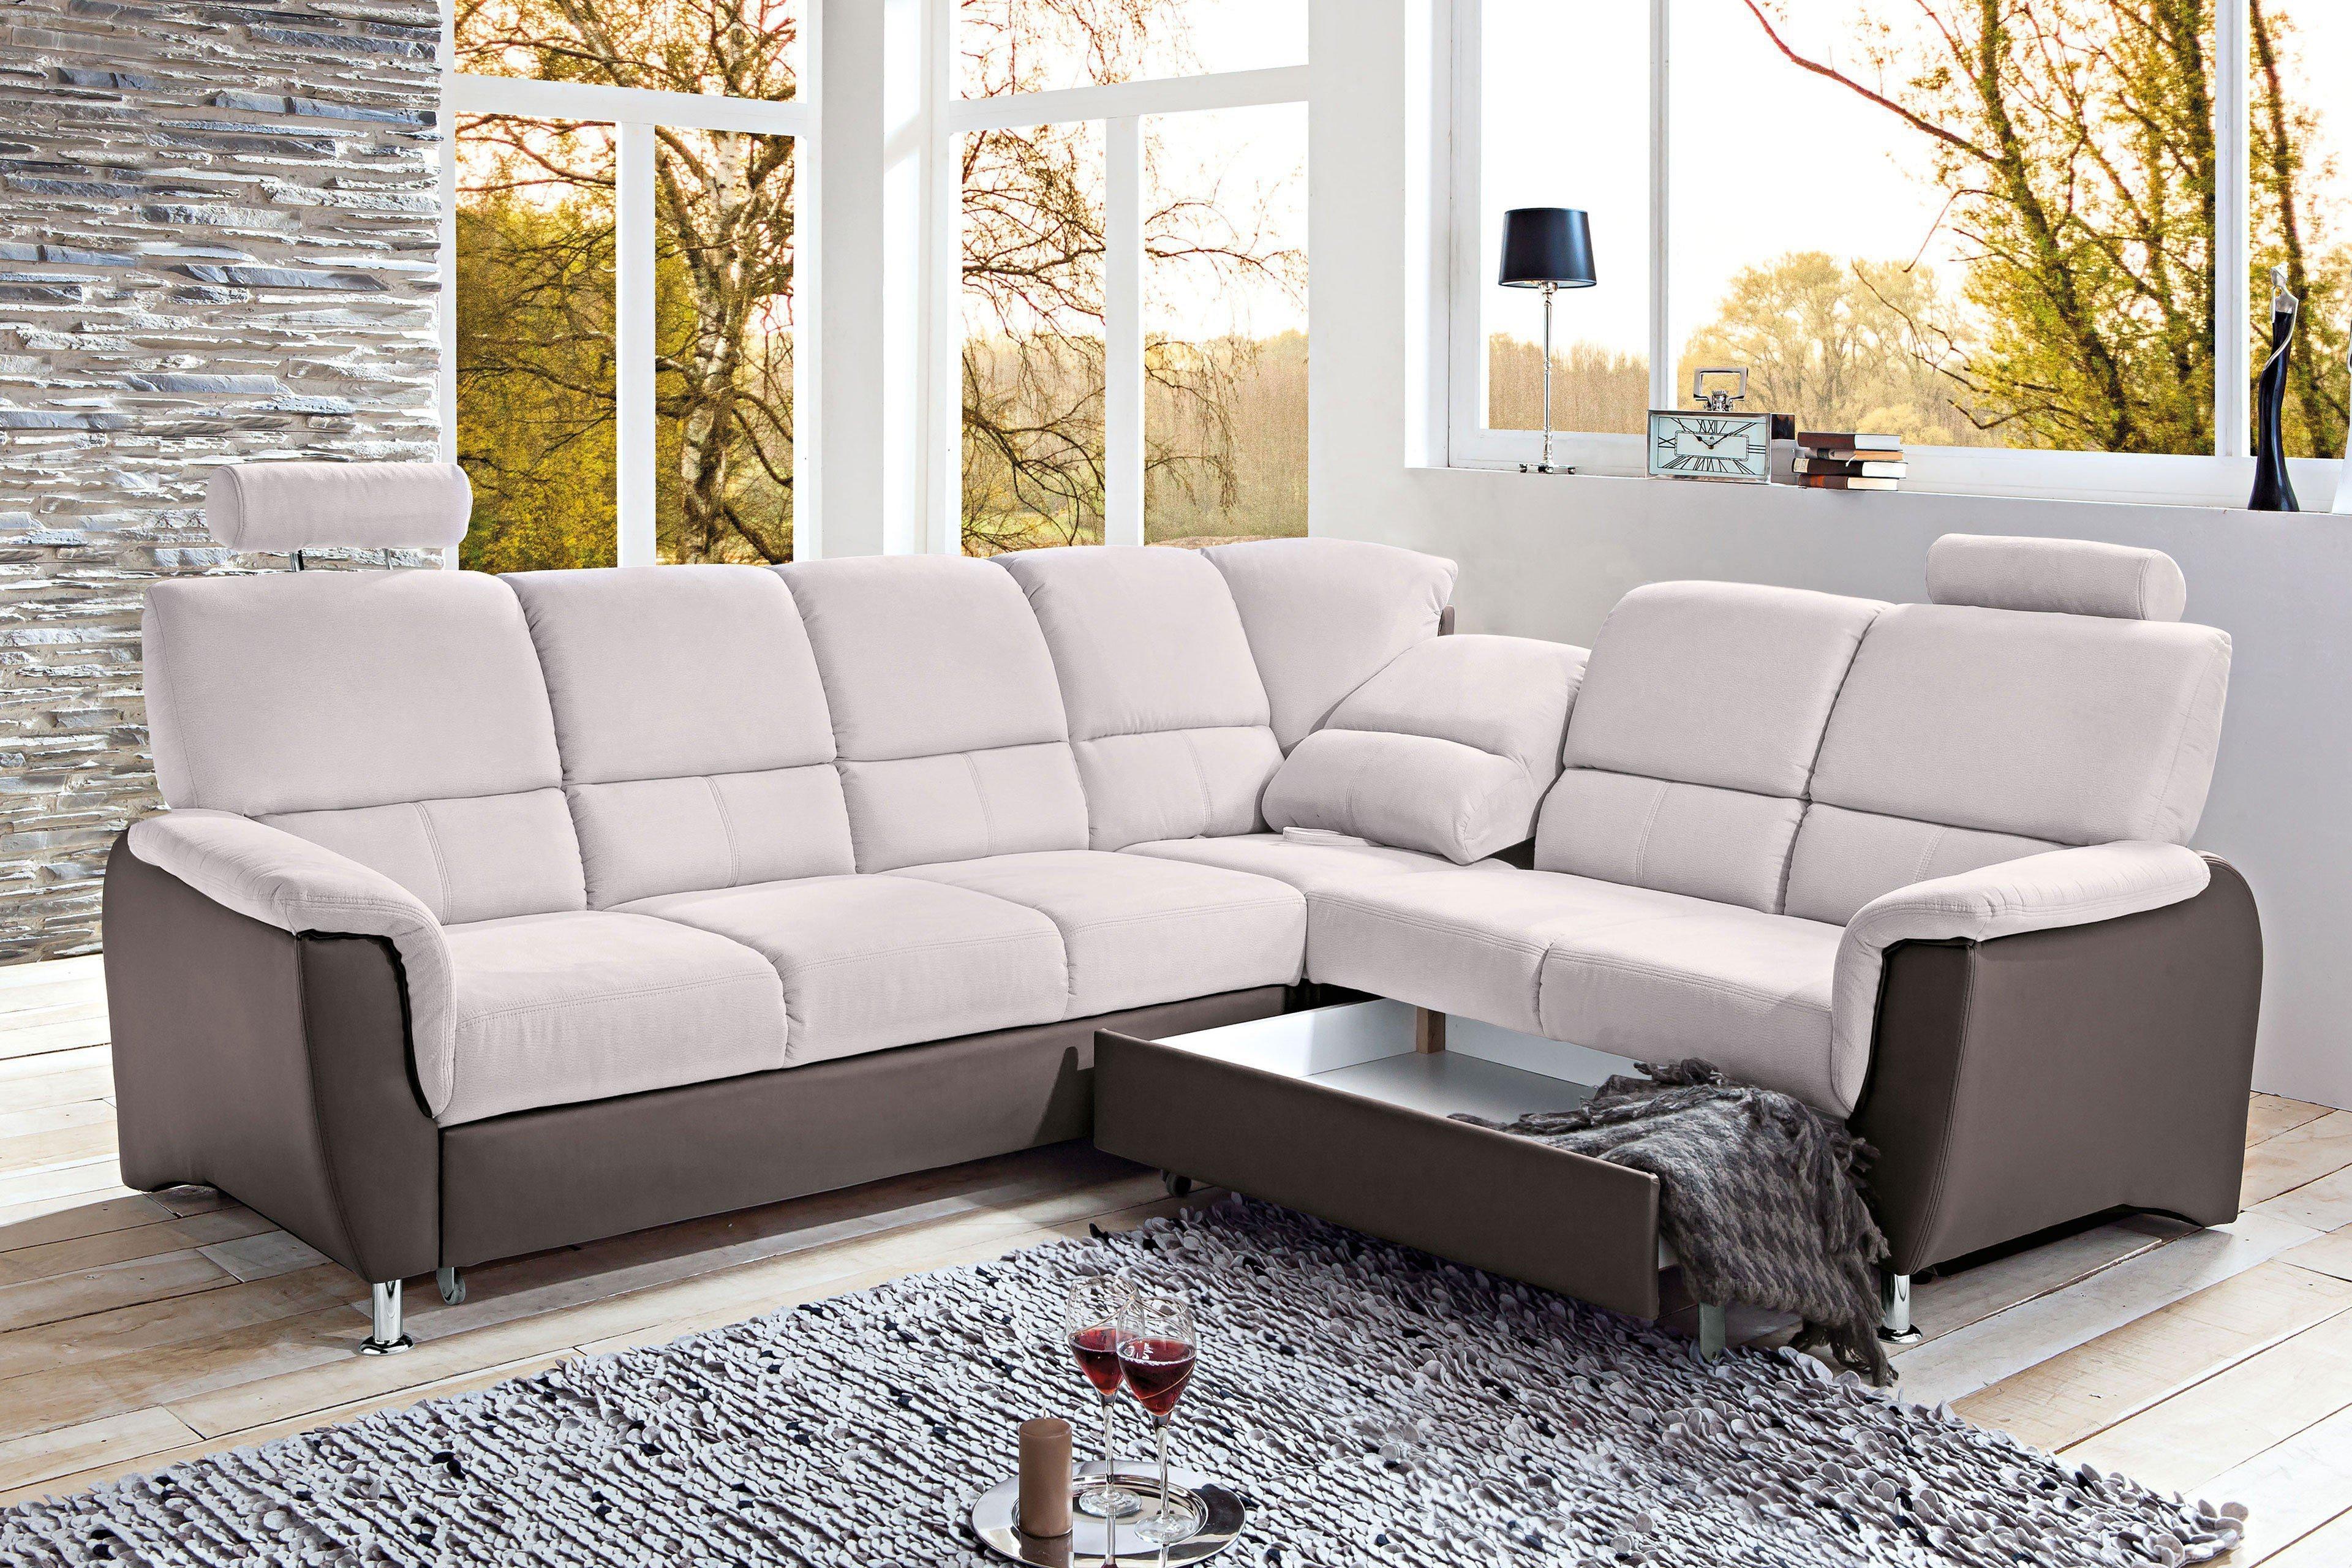 benformato pisa ecksofa hellgrau grau m bel letz ihr. Black Bedroom Furniture Sets. Home Design Ideas